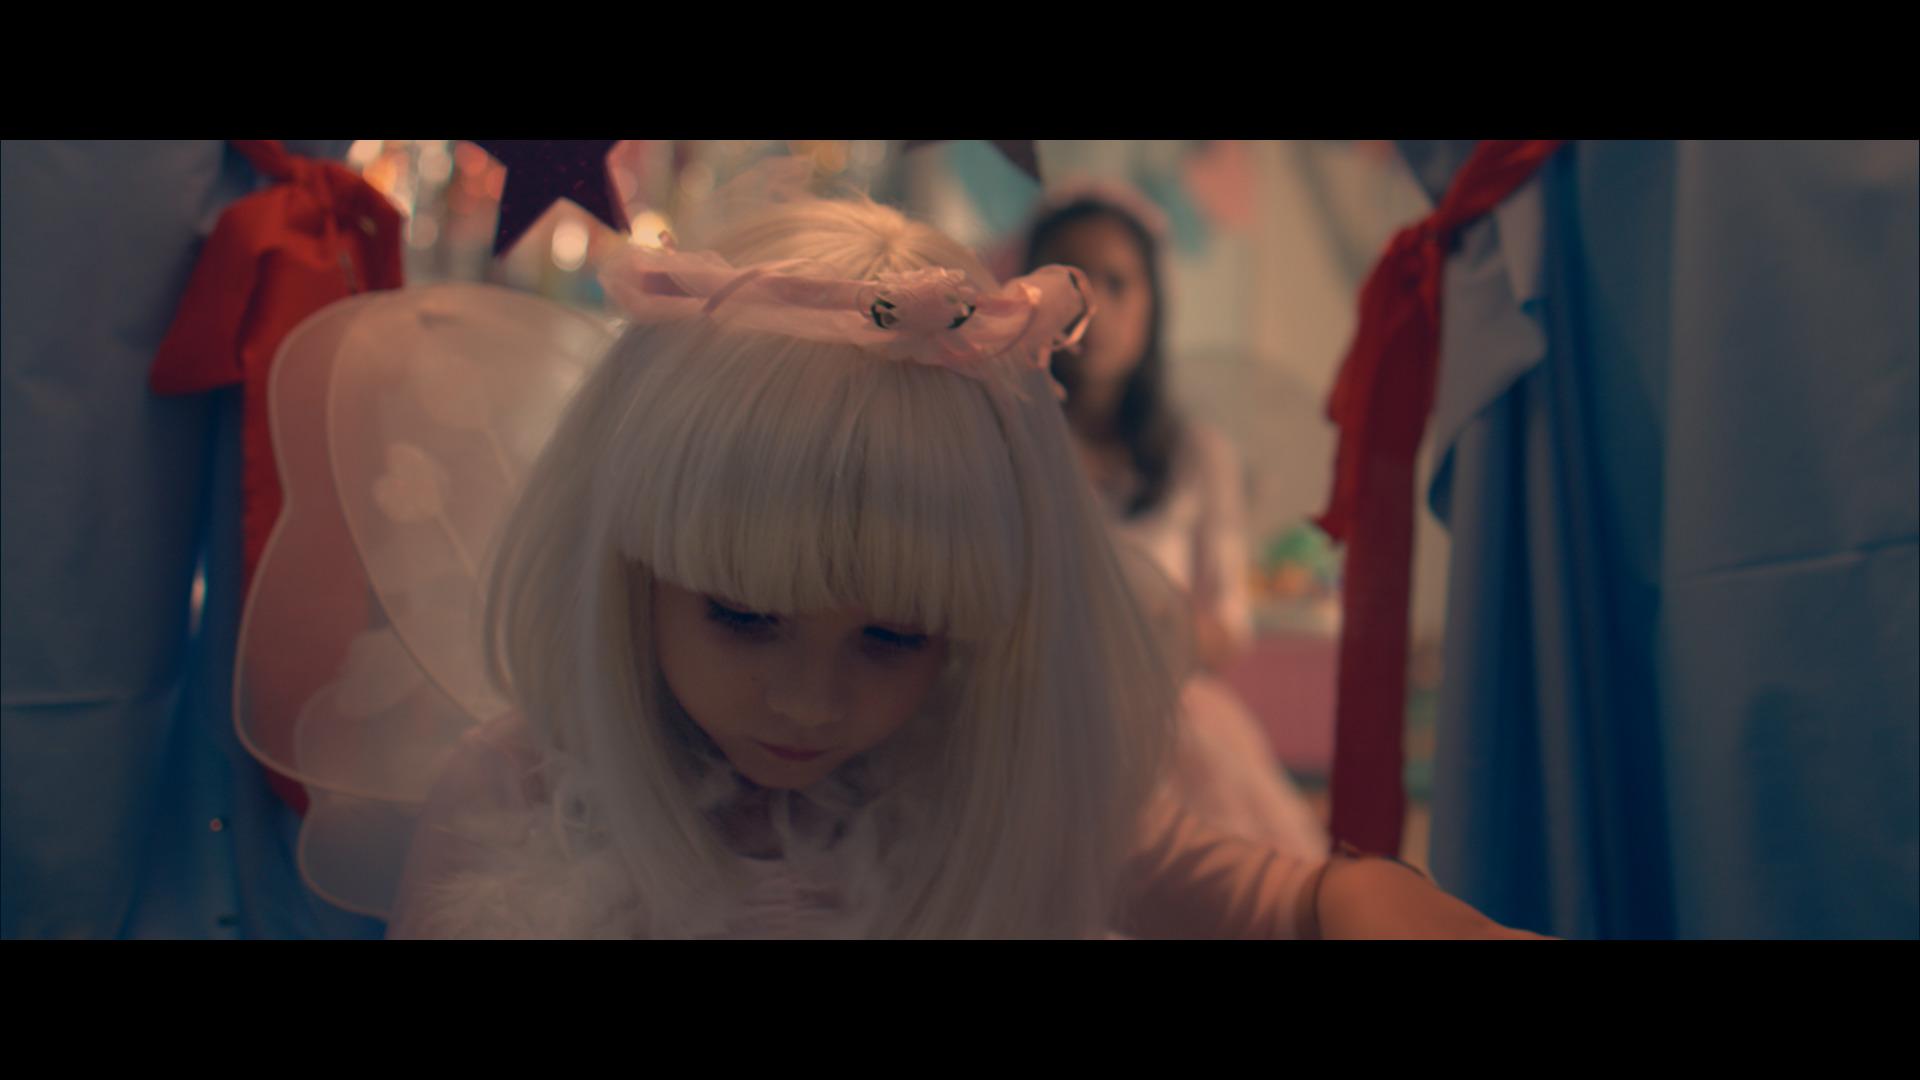 mysister_CancerFilm_Movie_Film_CornerStudio_